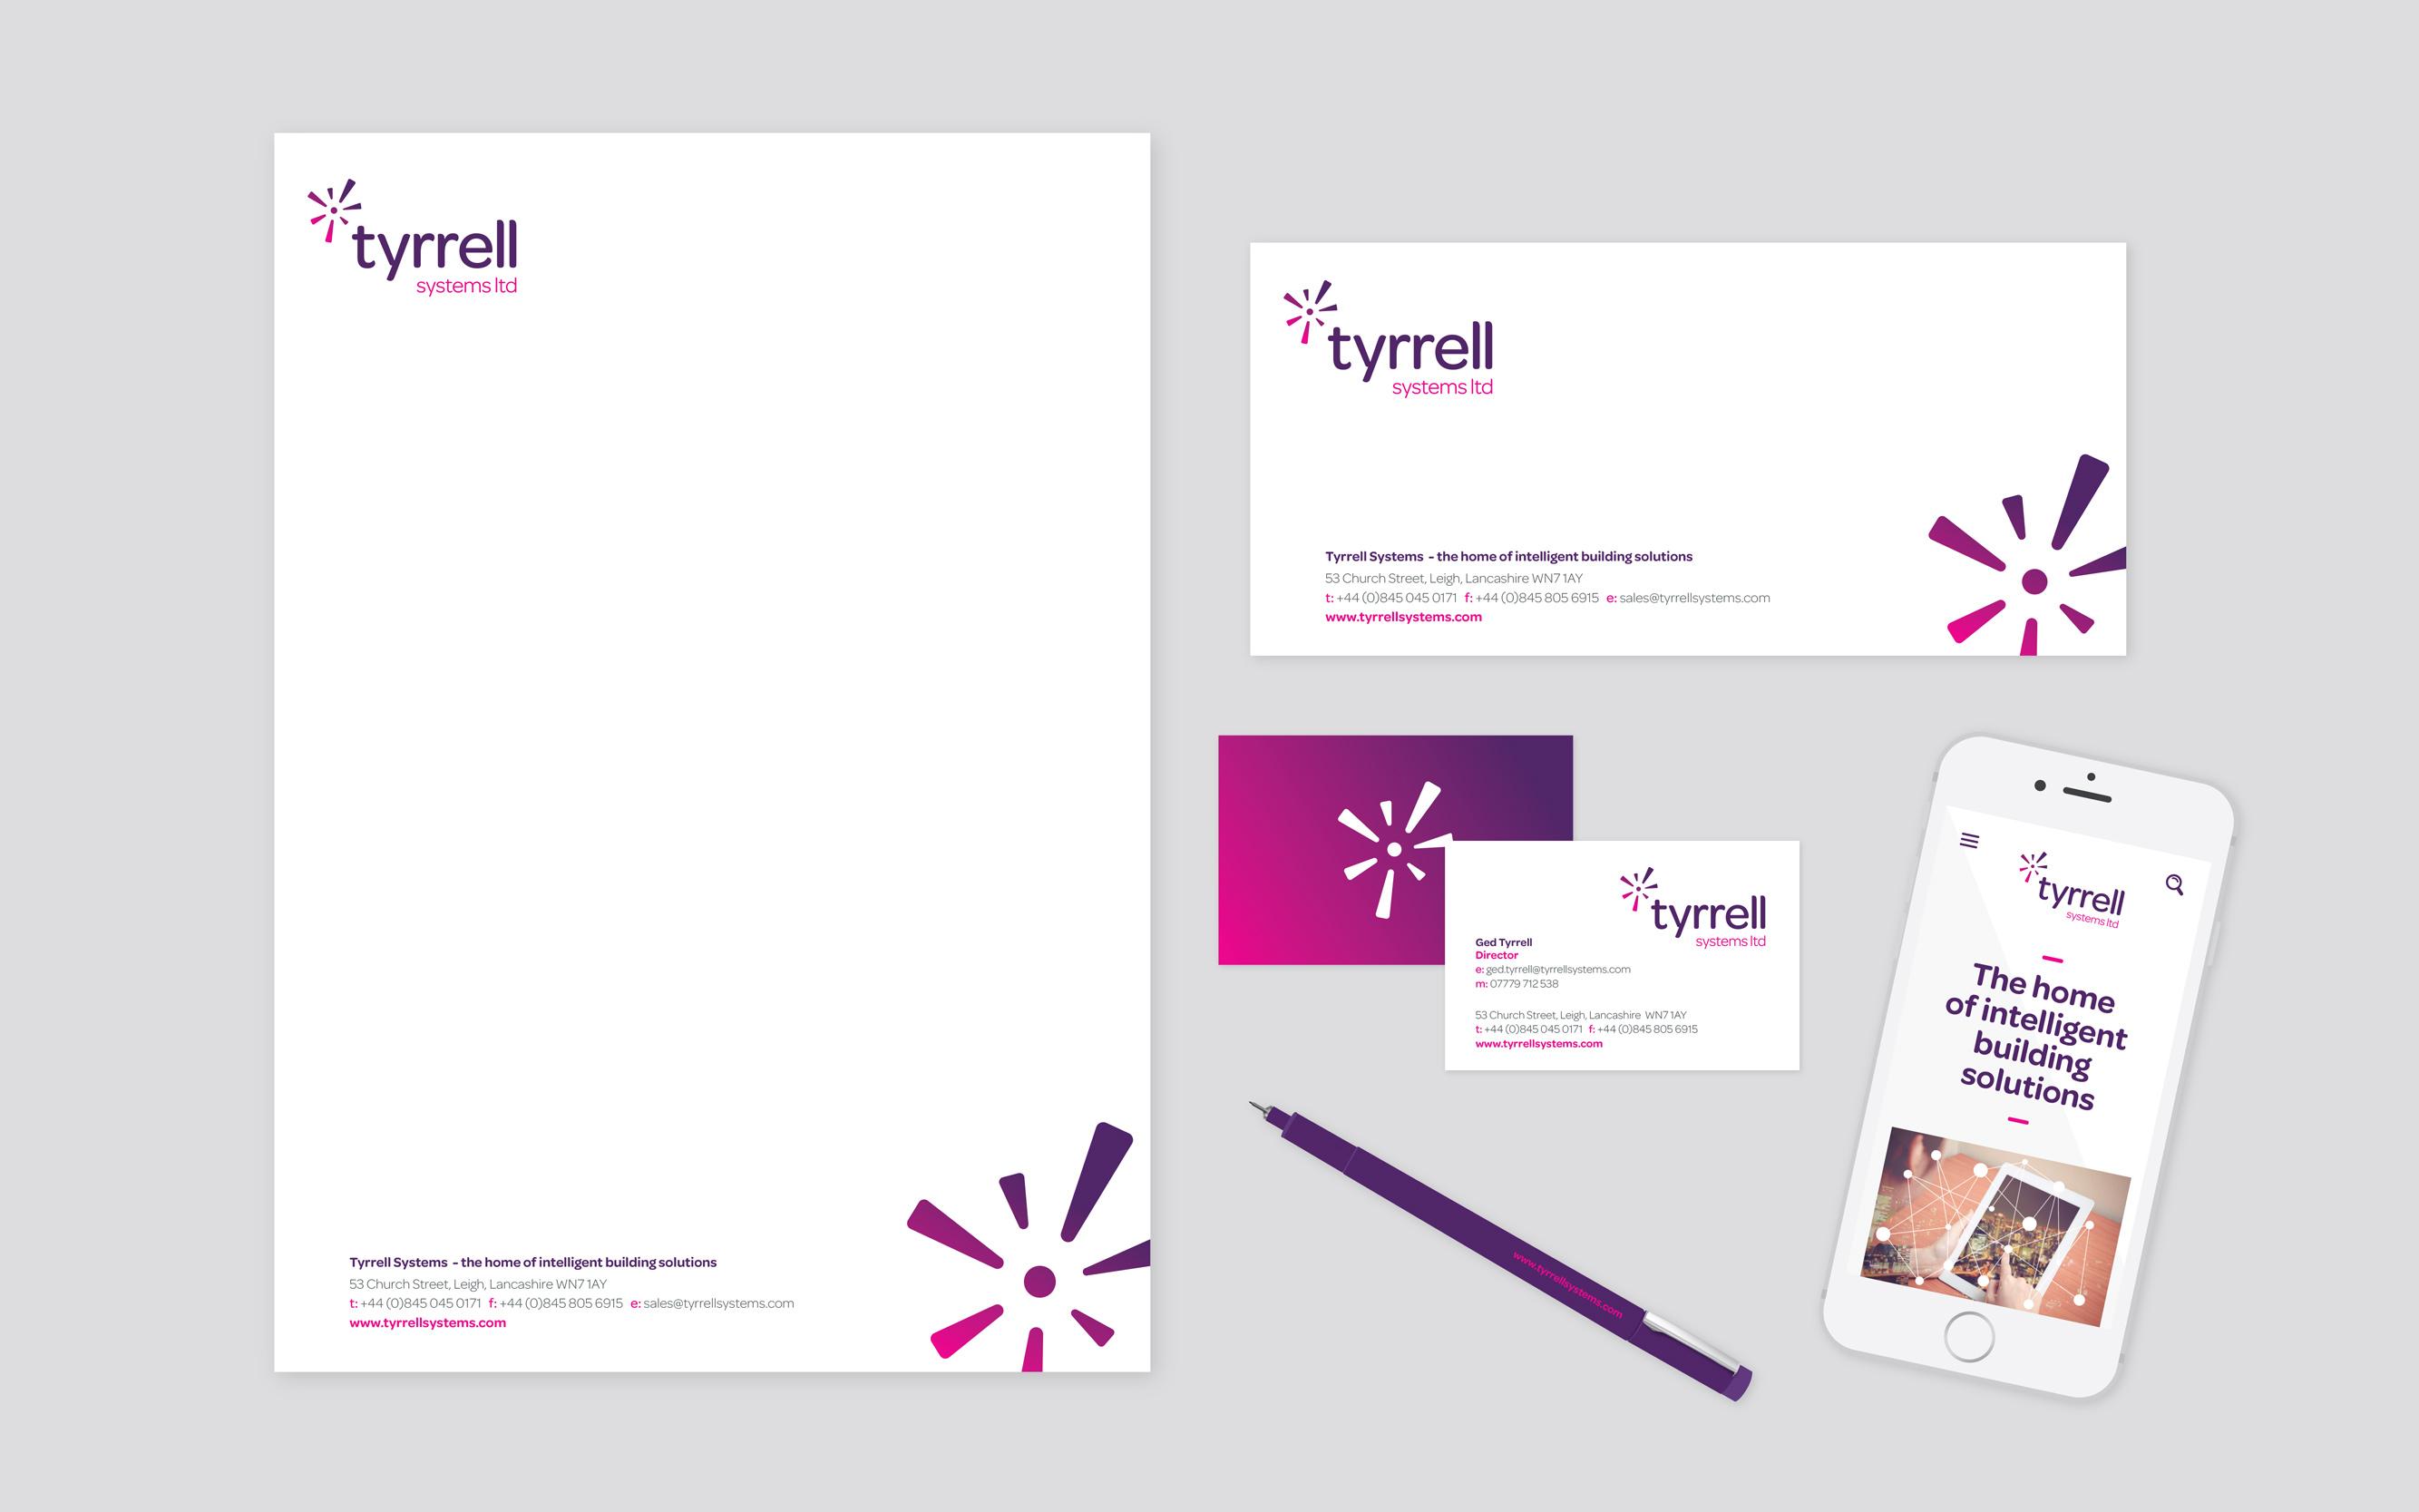 tyrrell-stationery